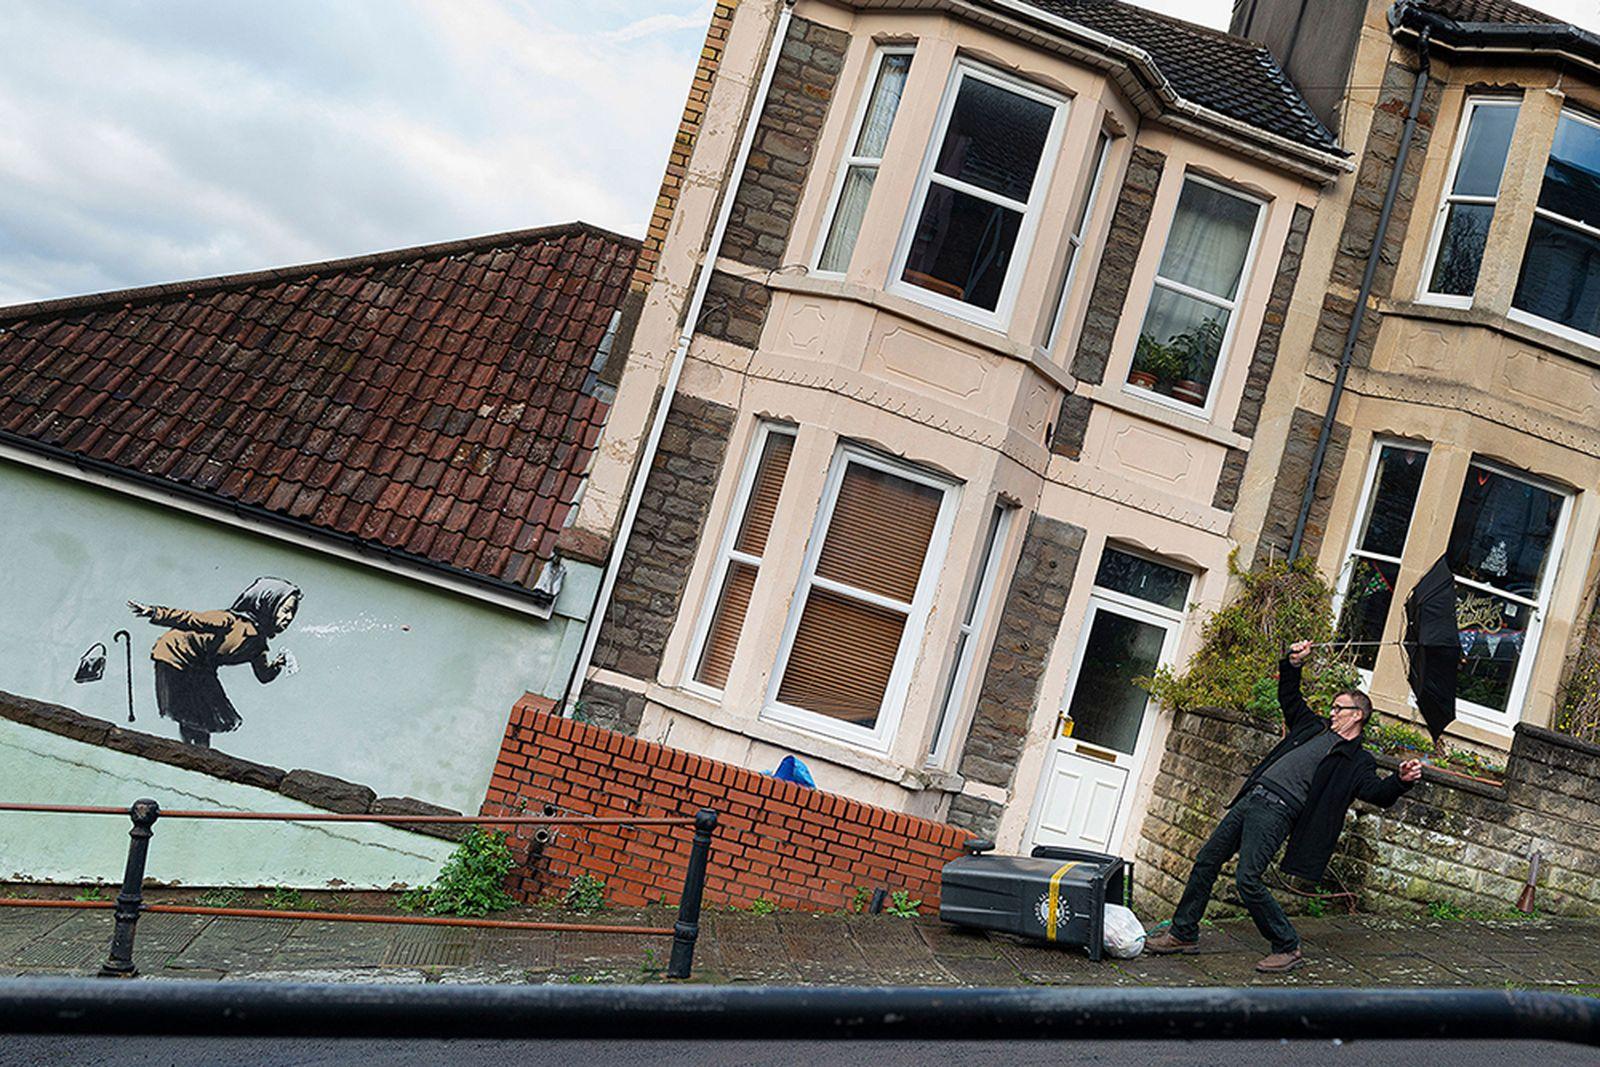 Banksy confirms he is behind sneezing woman artwork on Bristol house